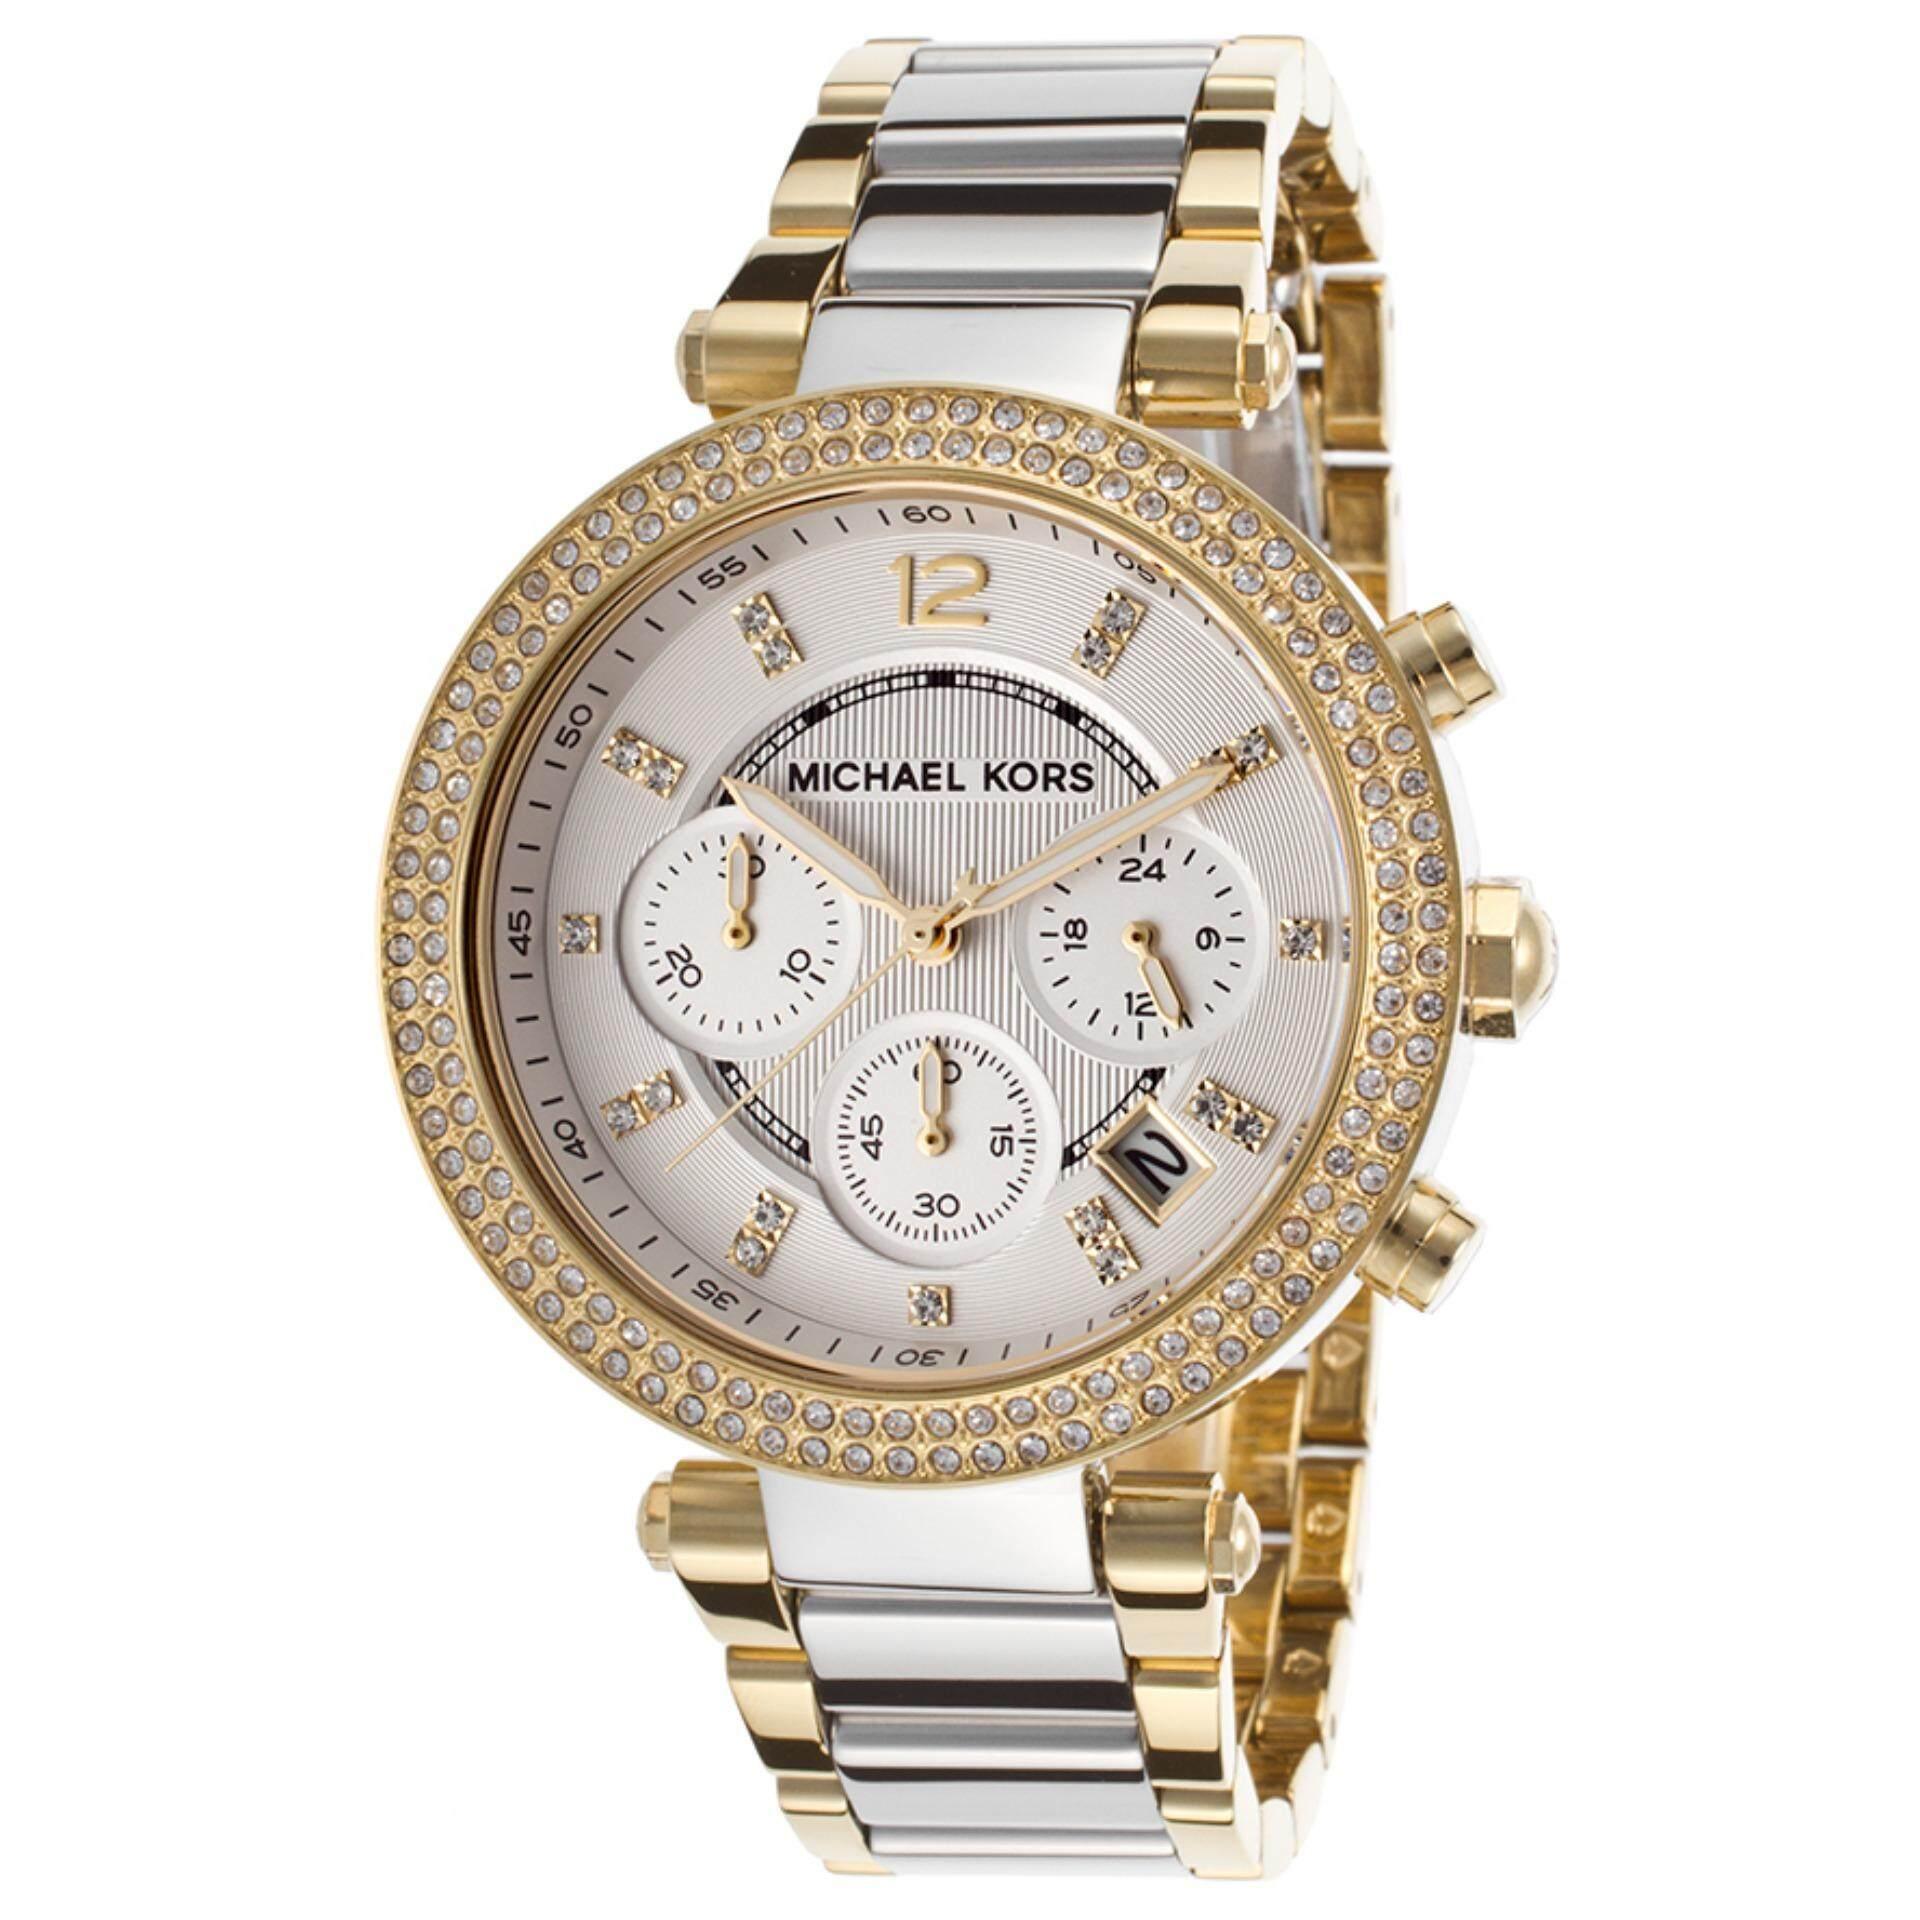 Michael Kors Womens Parker Chrono Crystal Bezel Two tone Watch MK5687 Malaysia